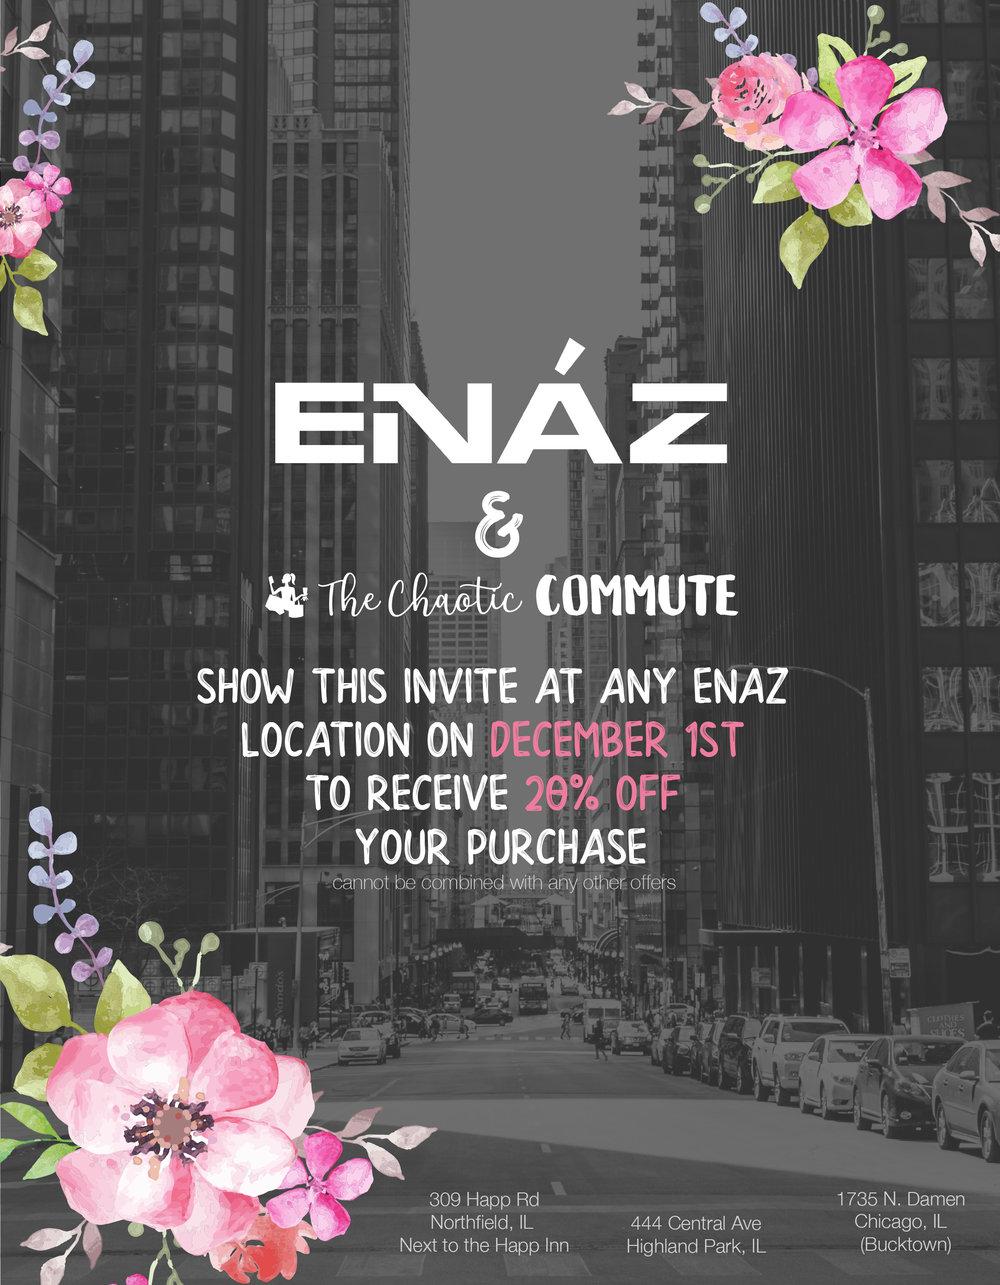 Enaz Invitation.jpg